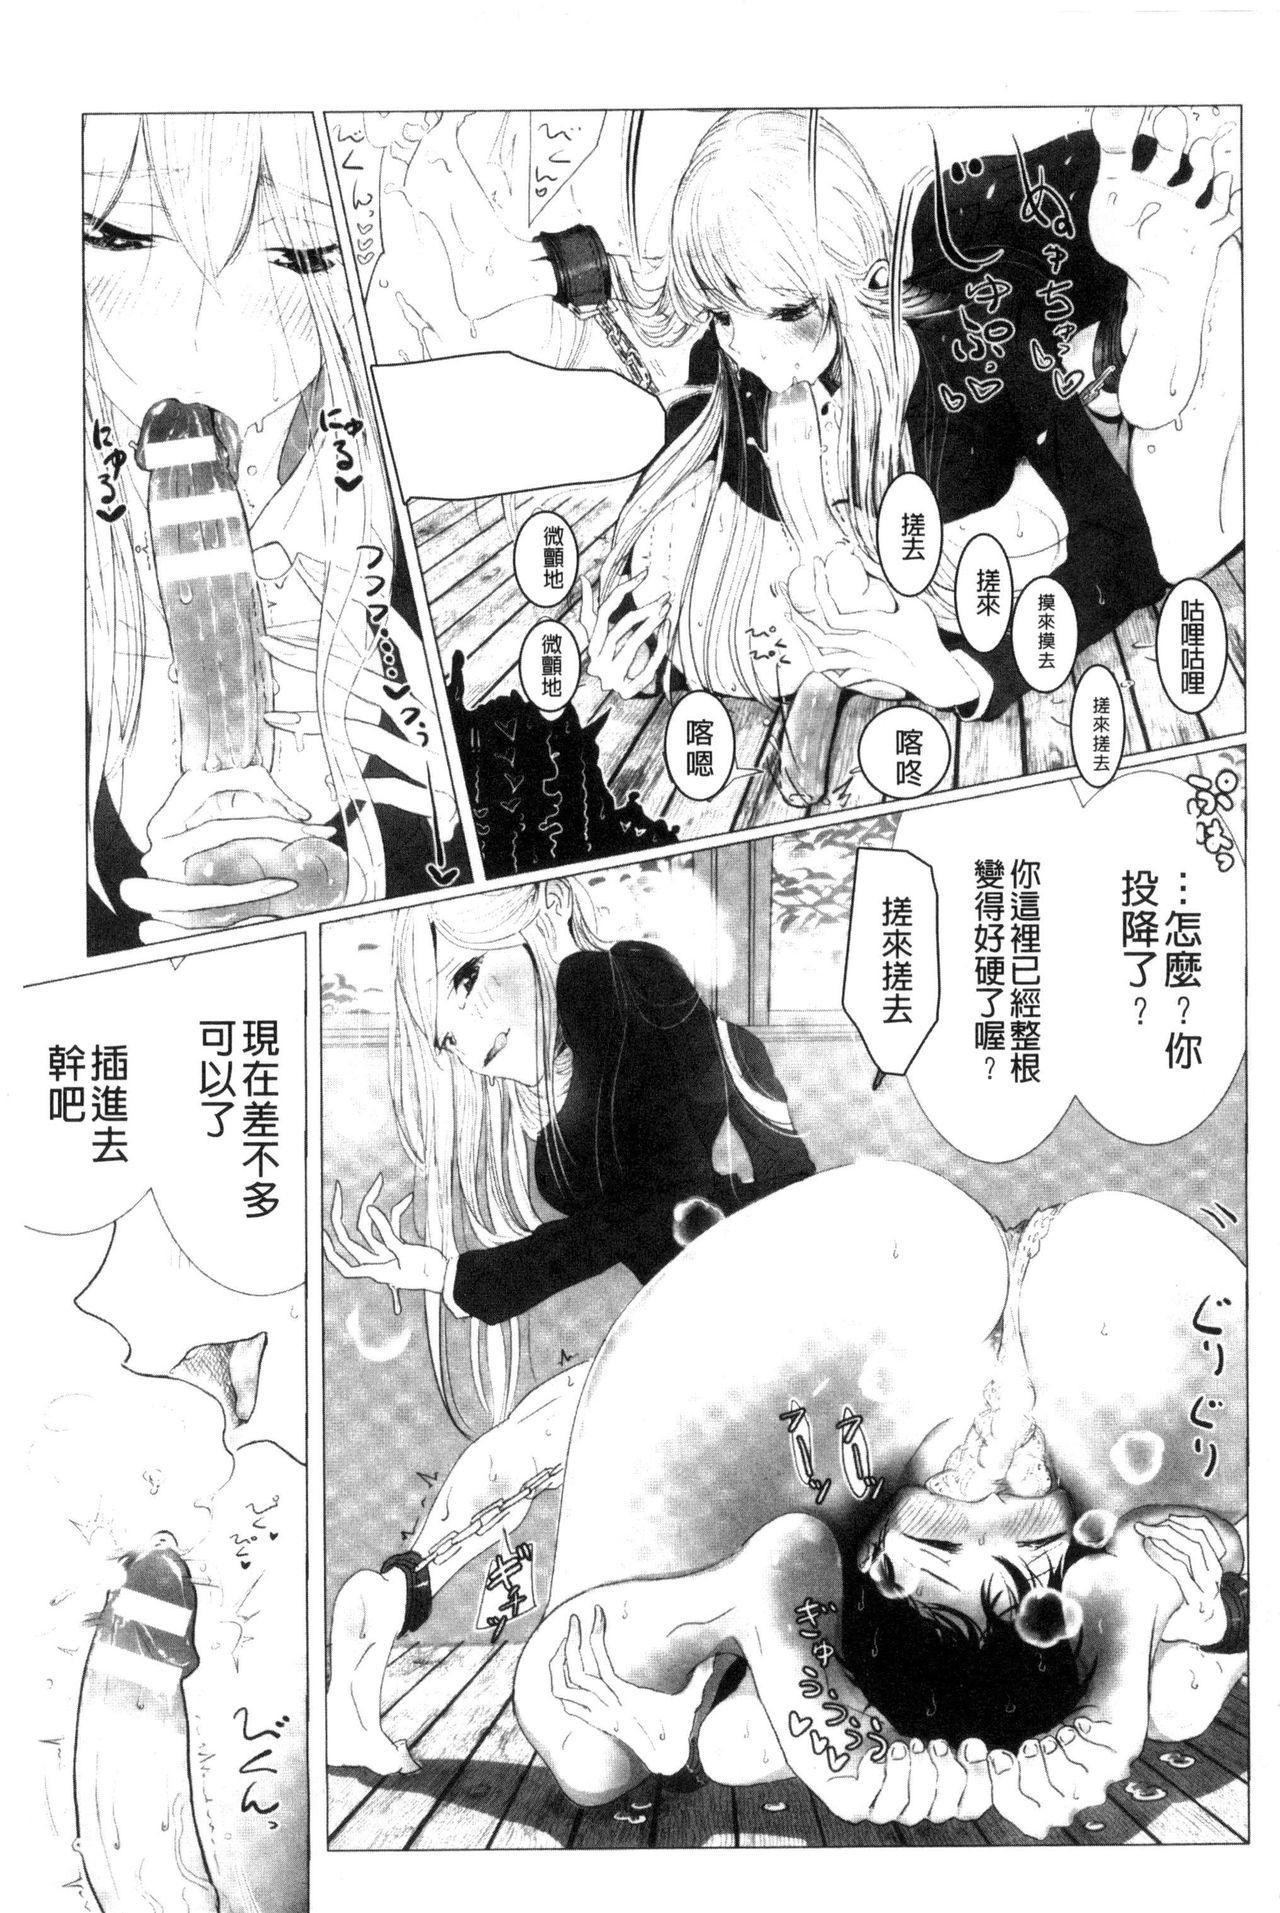 [Dhibi] Sono Yubisaki de Korogashite - Please Caress it at the Finger-tip. [Chinese] 174